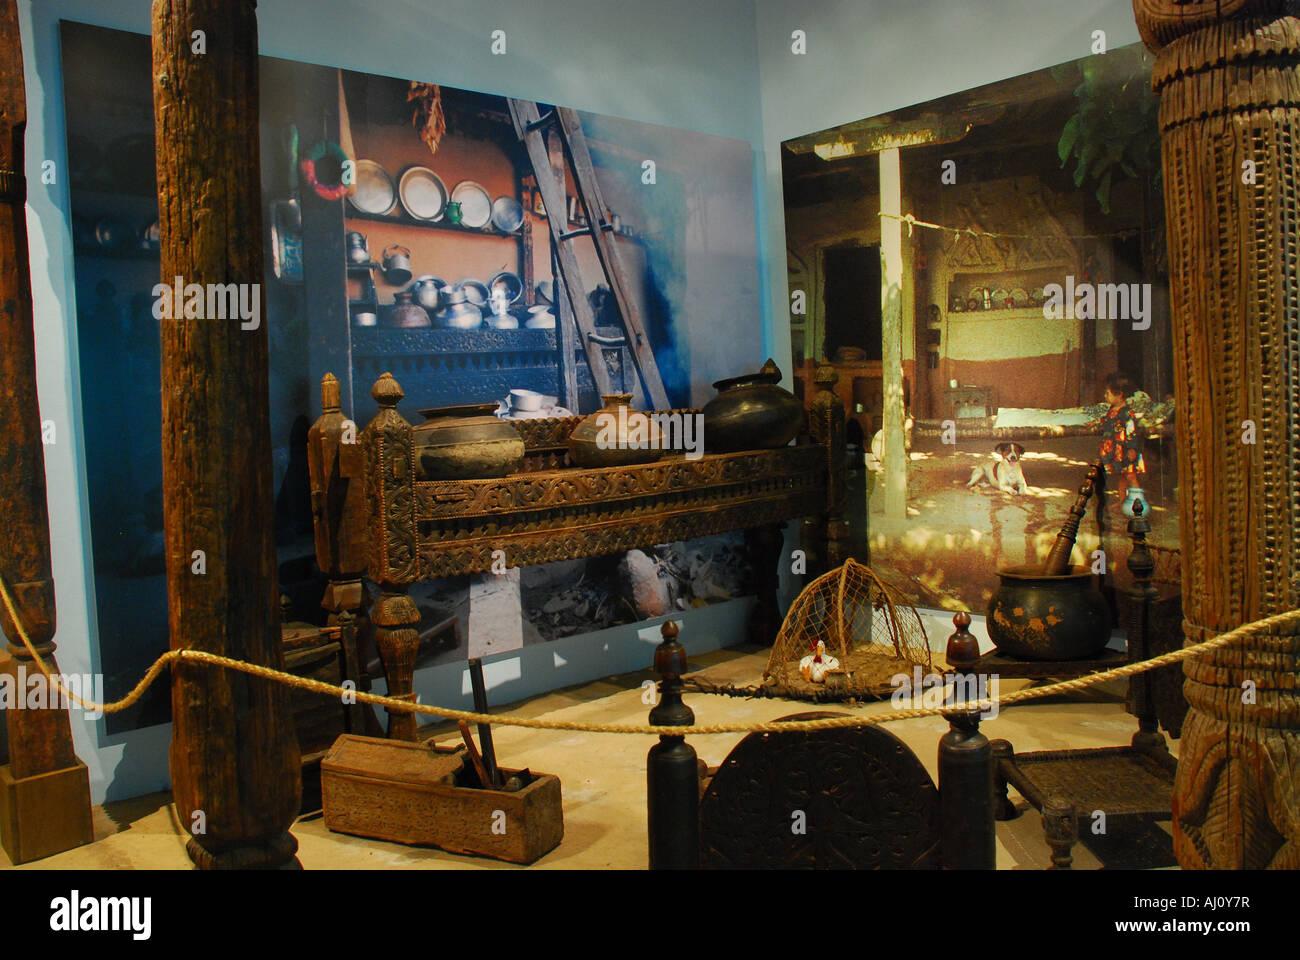 Homestead in Swat, Ethnografic museum Lindenmuseum Stuttgart Baden Wuerttemberg Germany - Stock Image